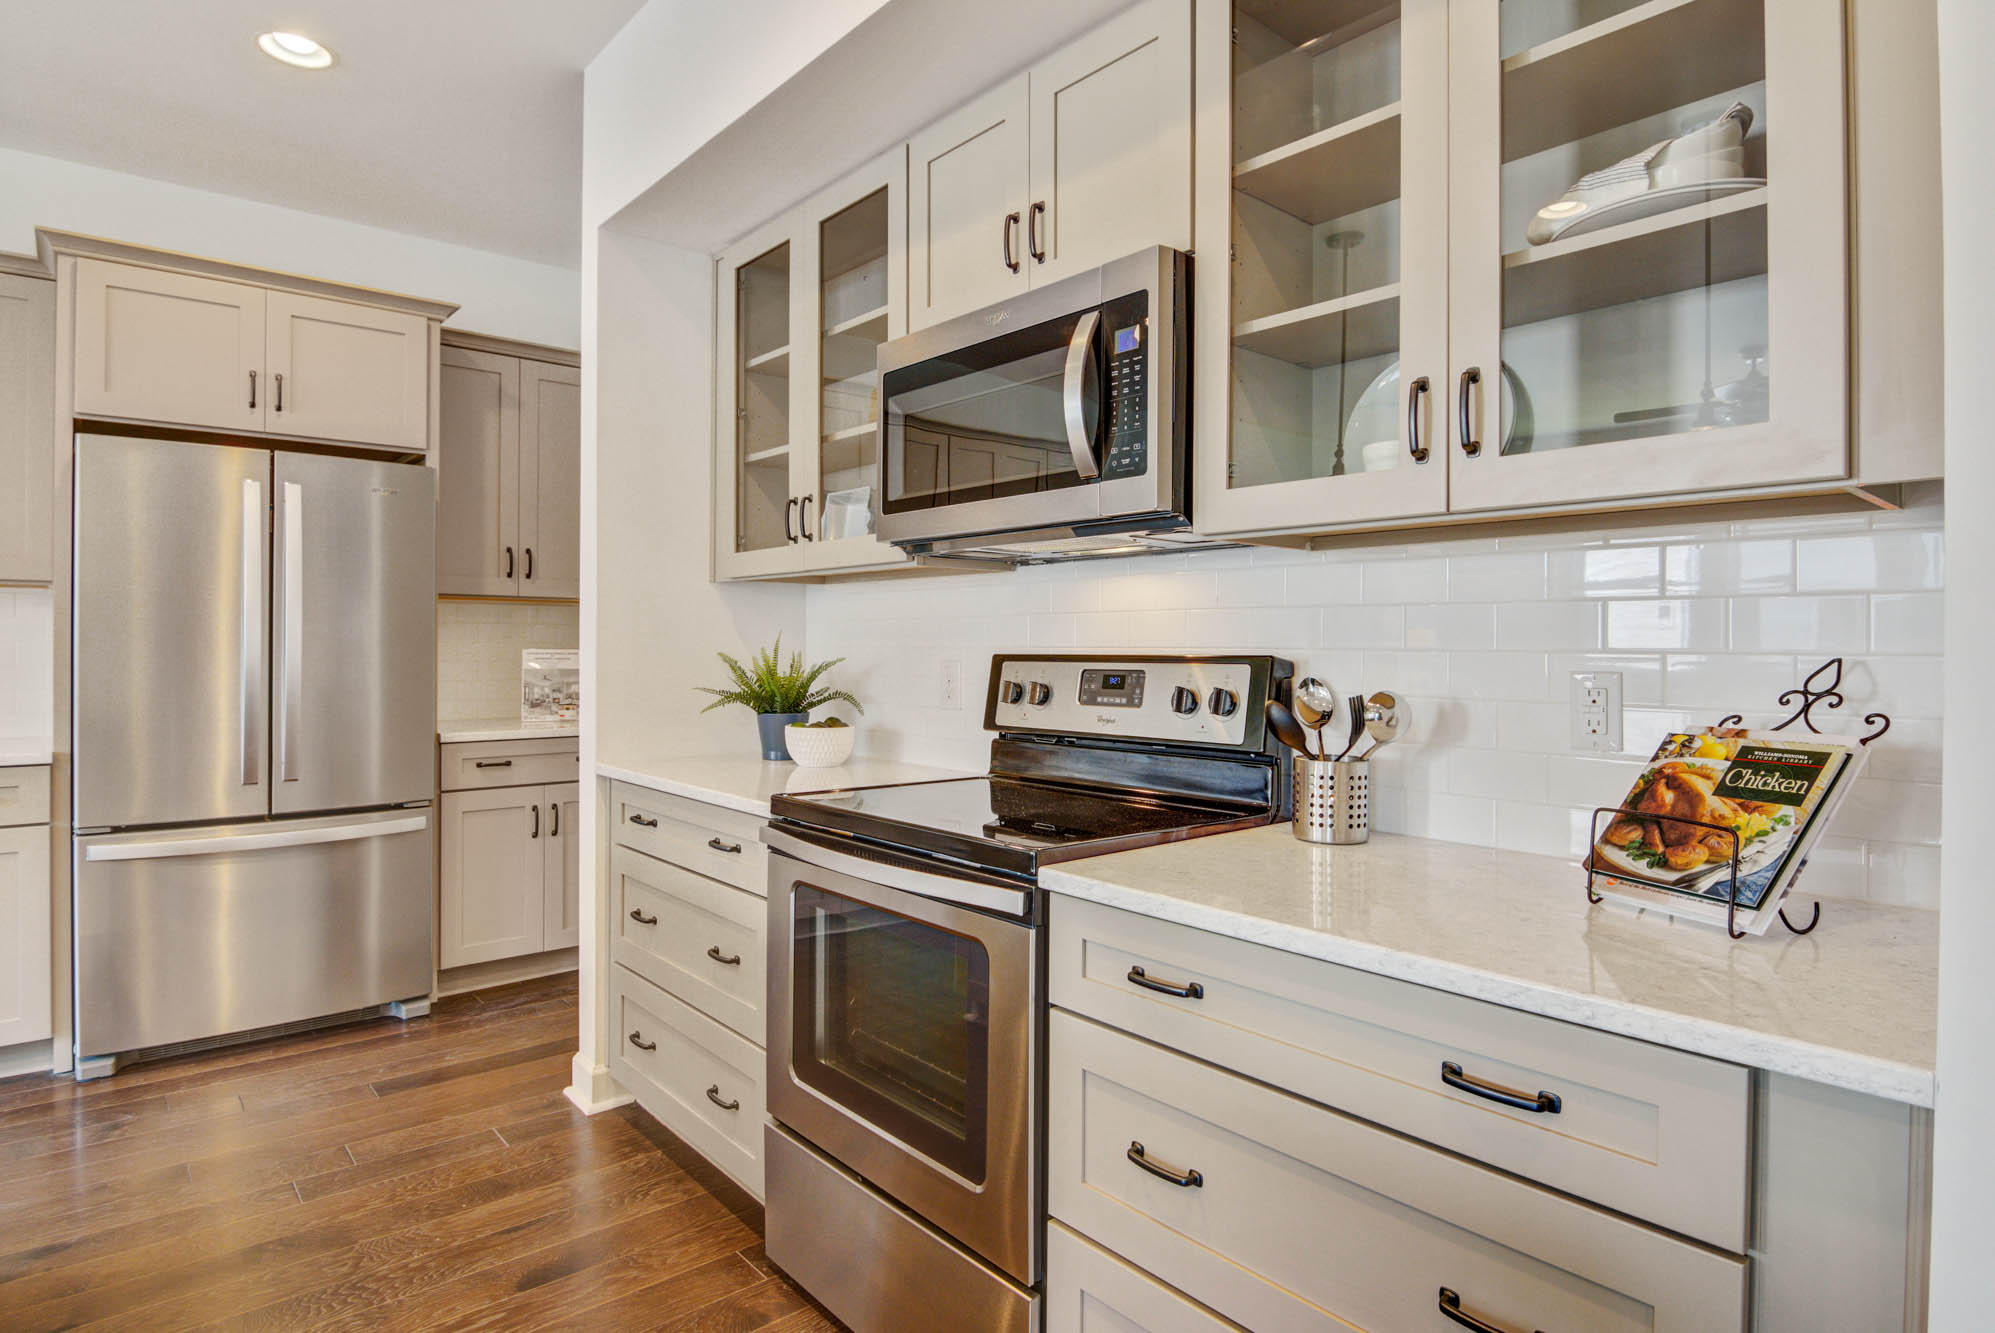 Marshview Commons Homes For Sale - 530 Mclernon, Johns Island, SC - 22